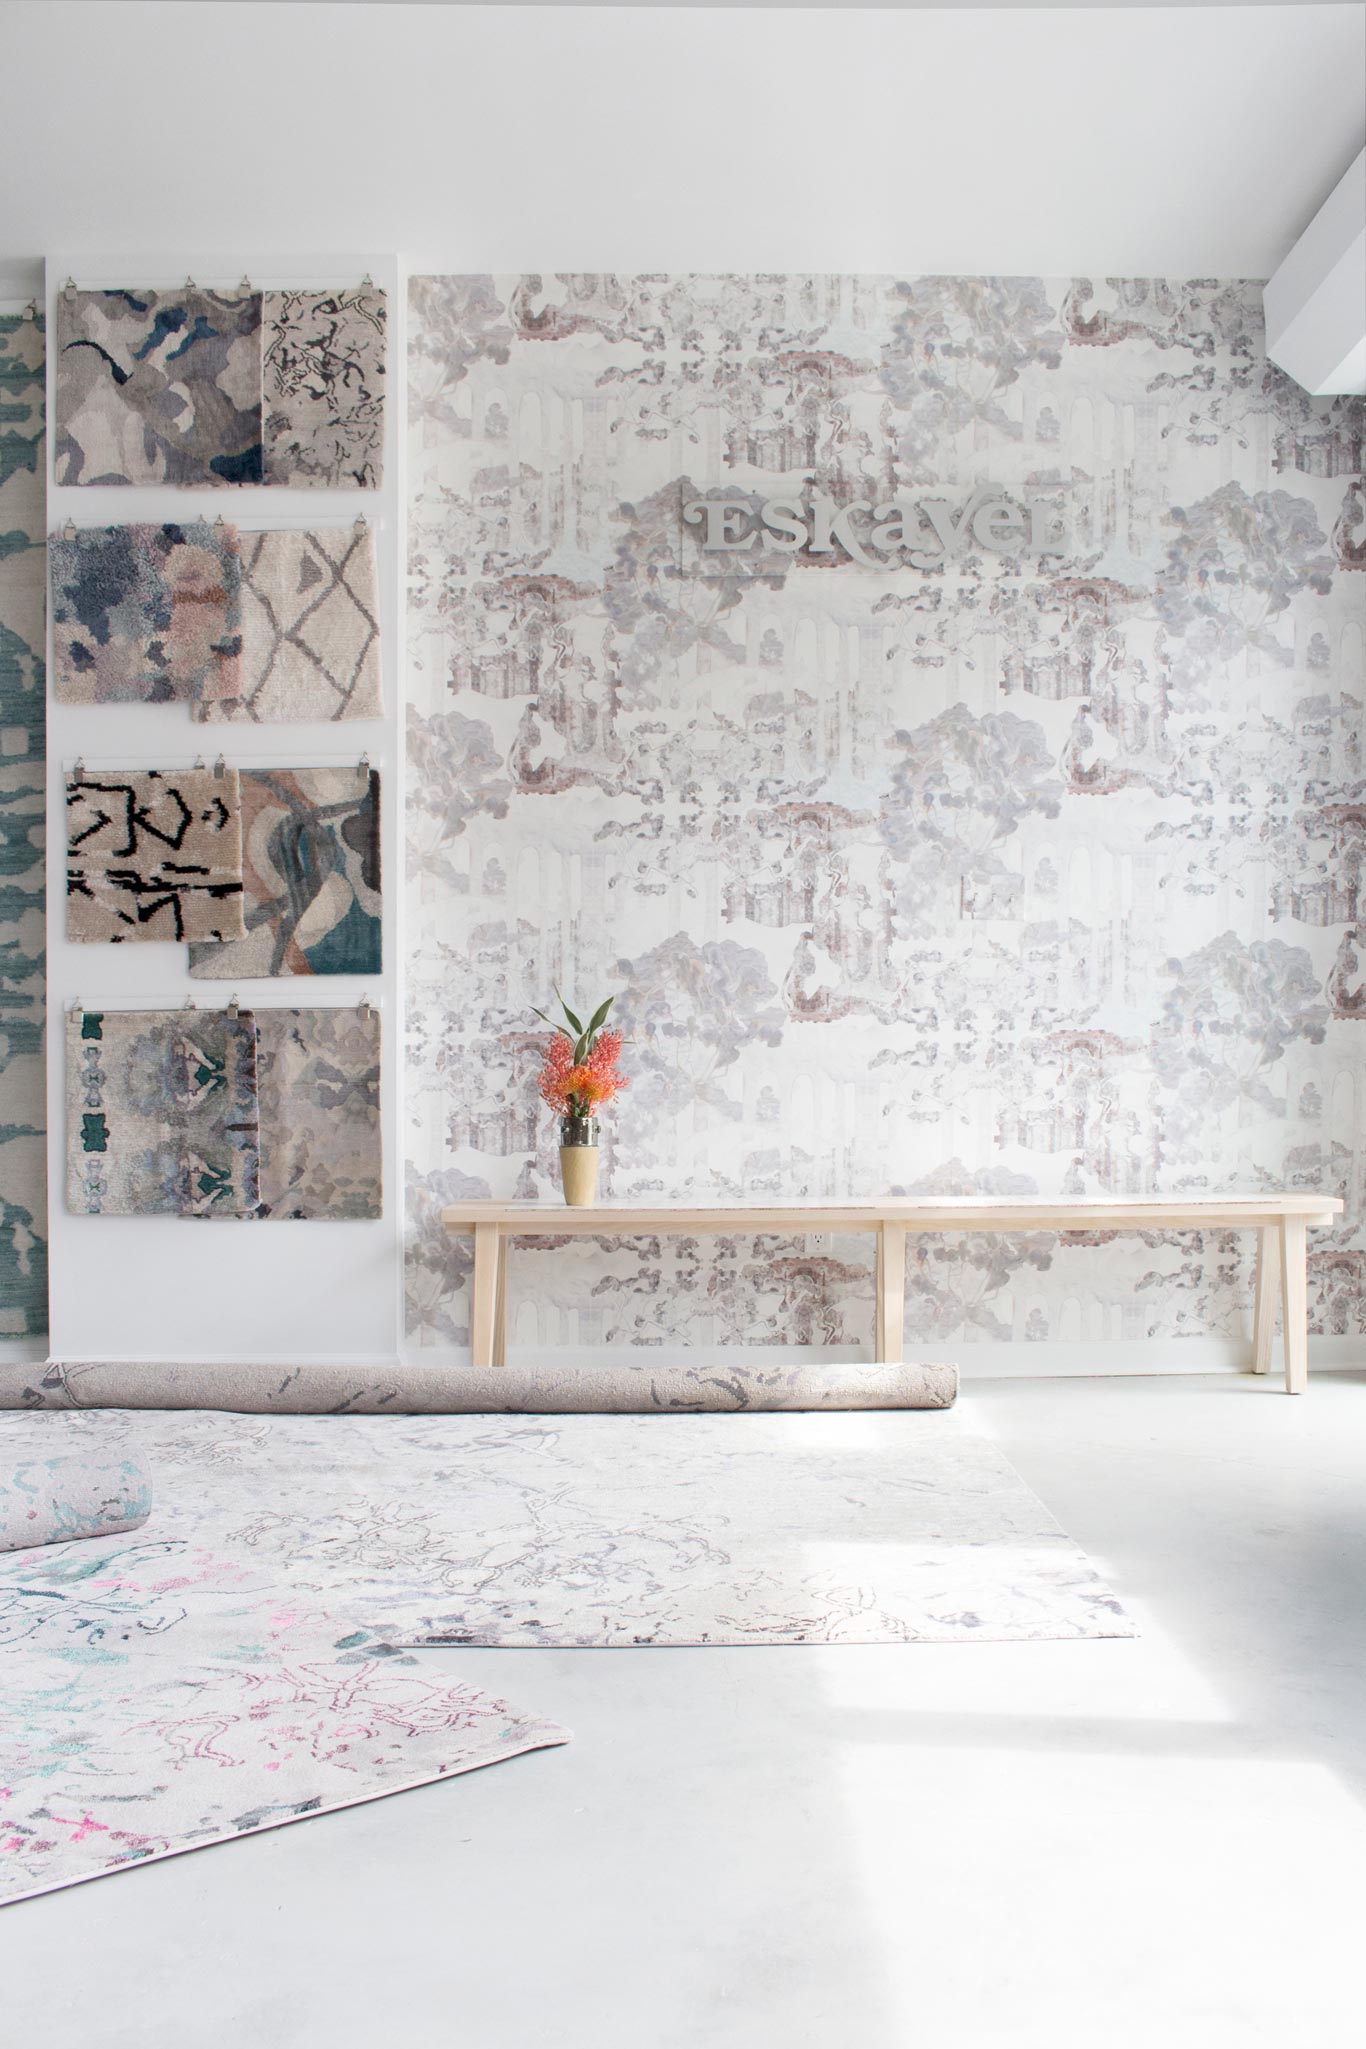 Eskayel-wallpaper-wp5007167